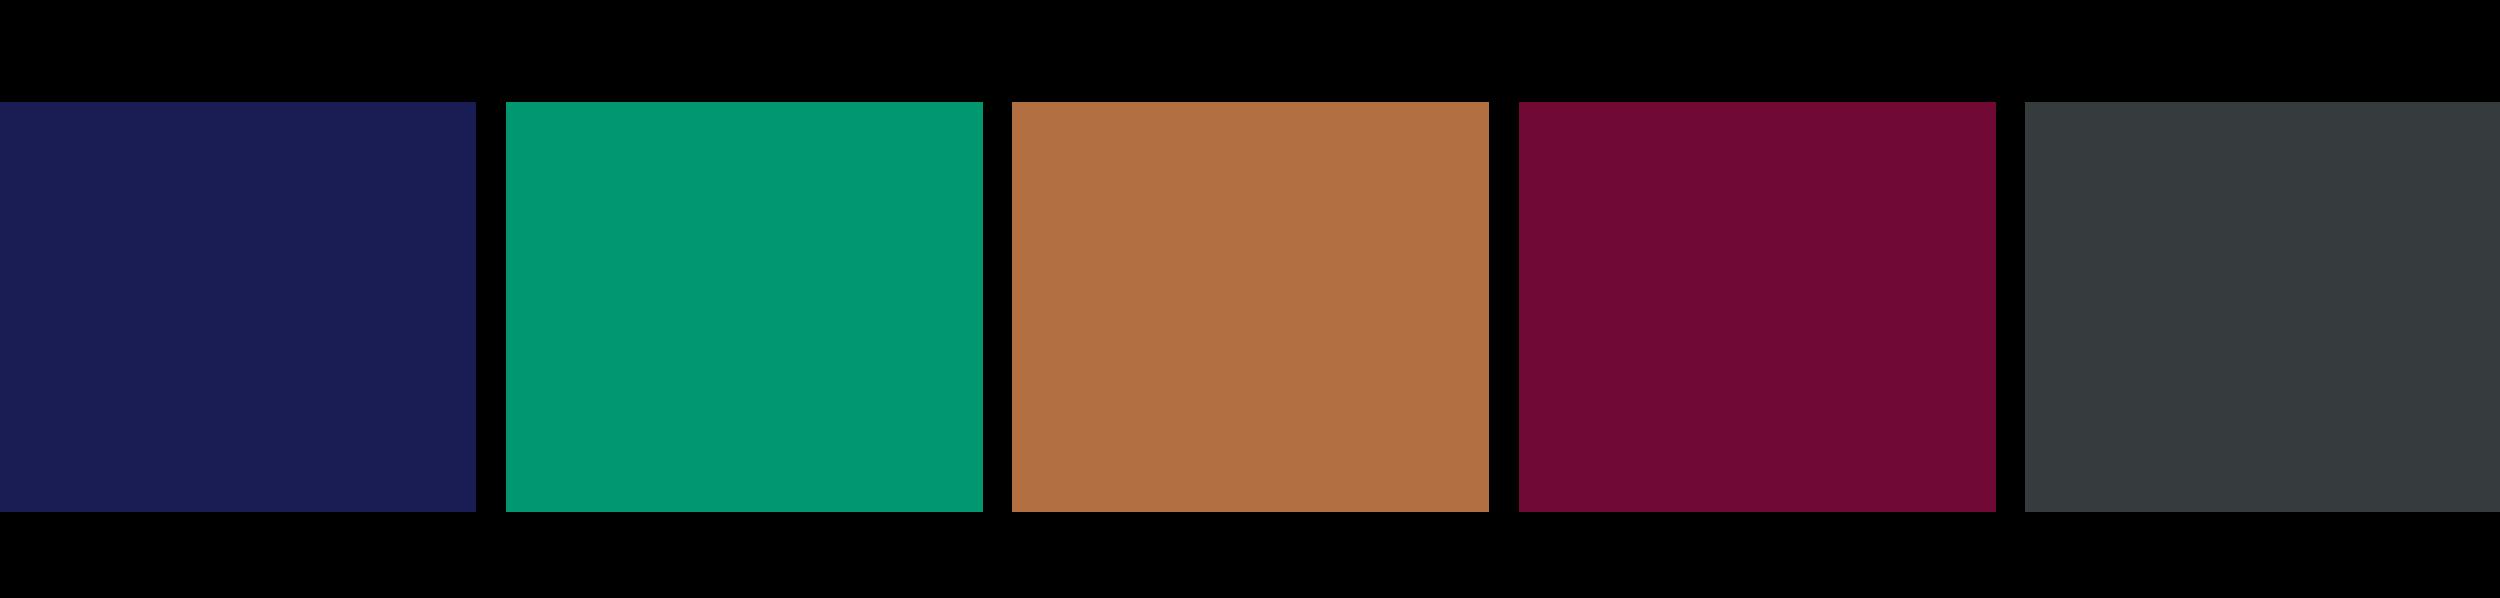 Light Skin Clothing Color Palette Guide